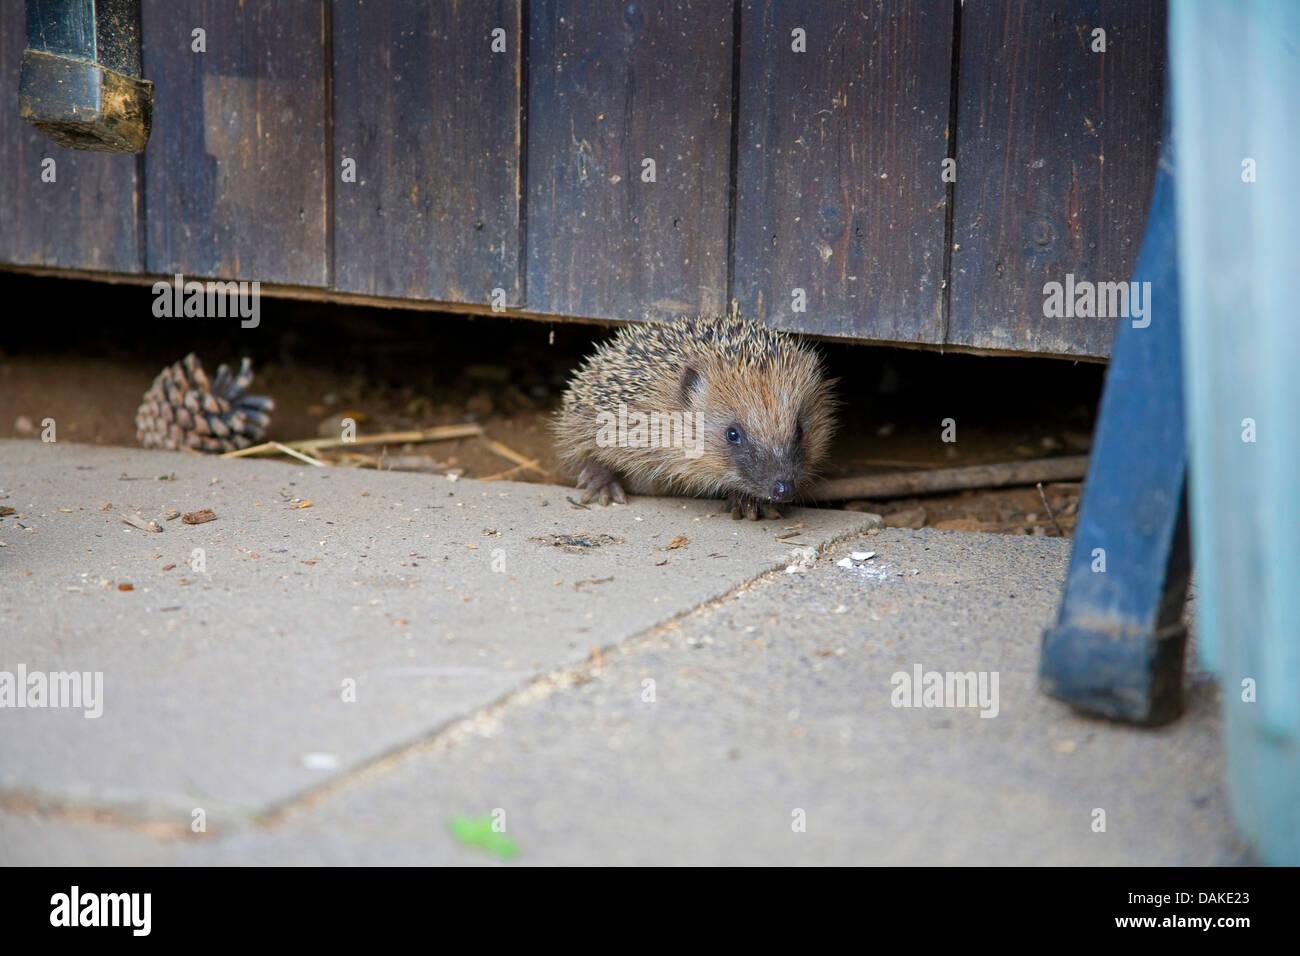 Western hedgehog, European hedgehog (Erinaceus europaeus), crawling out under a wooden hut, Germany - Stock Image